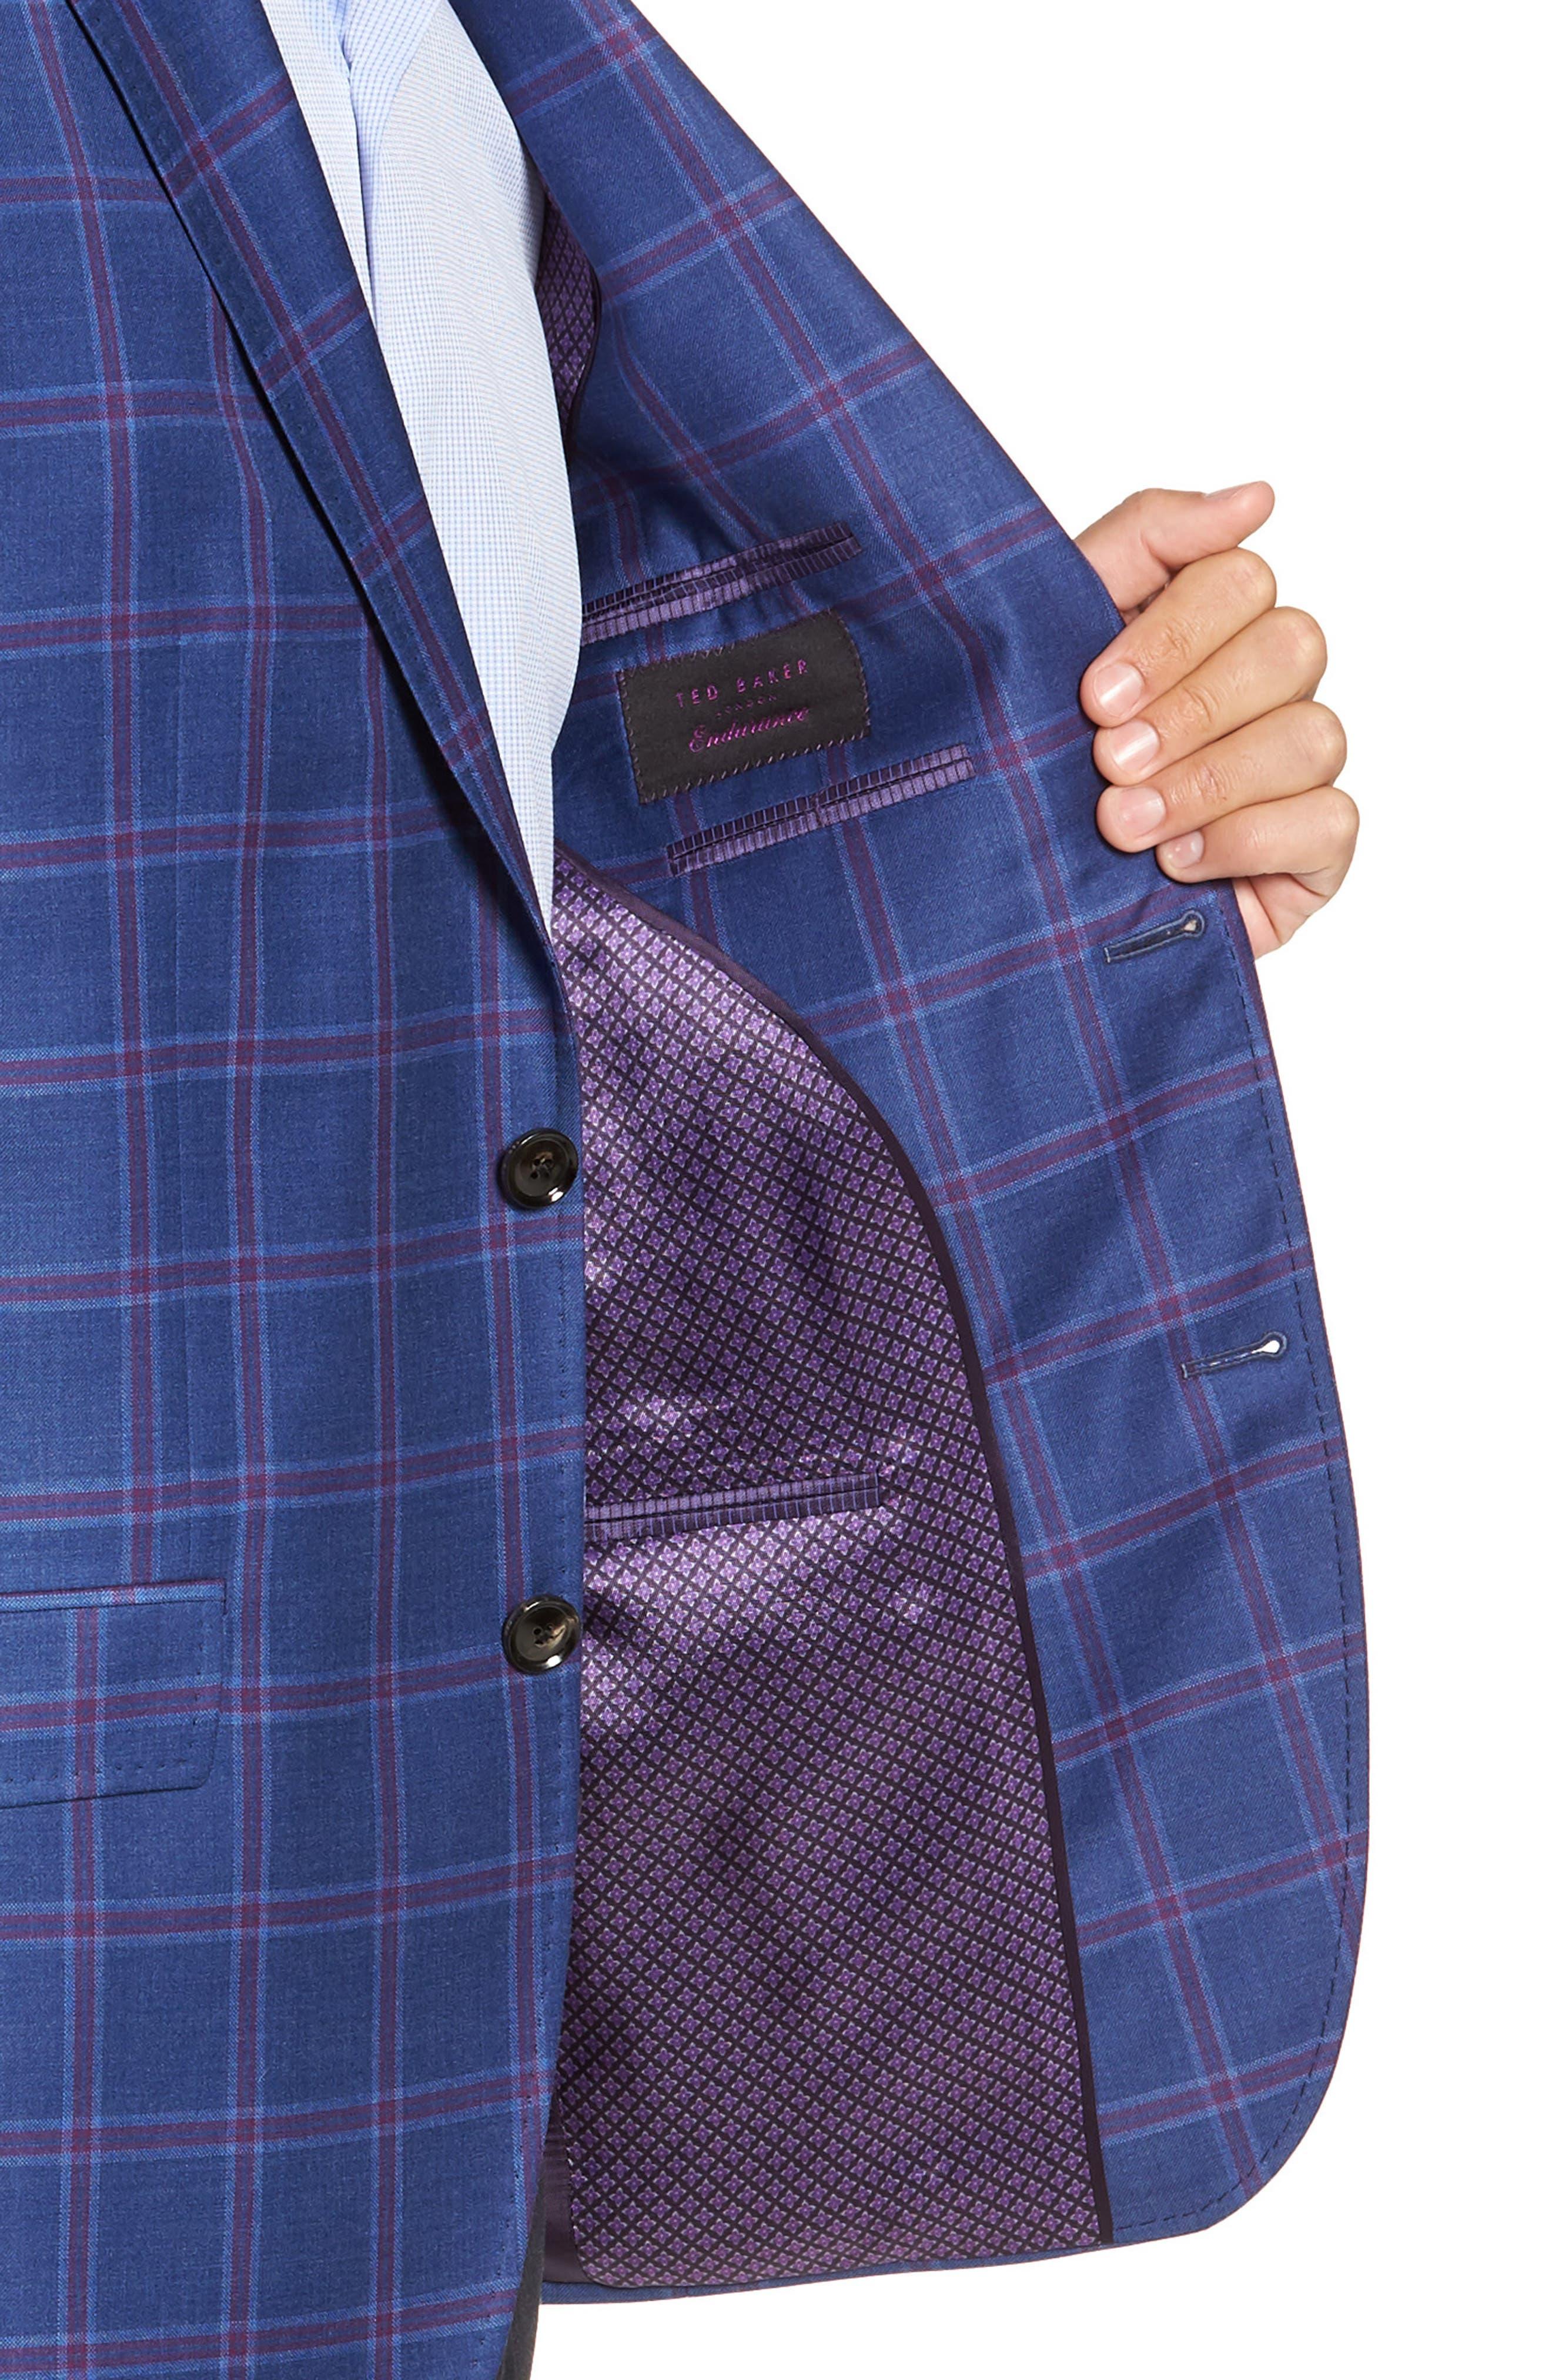 TED BAKER LONDON, Konan Trim Fit Wool Sport Coat, Alternate thumbnail 4, color, BLUE